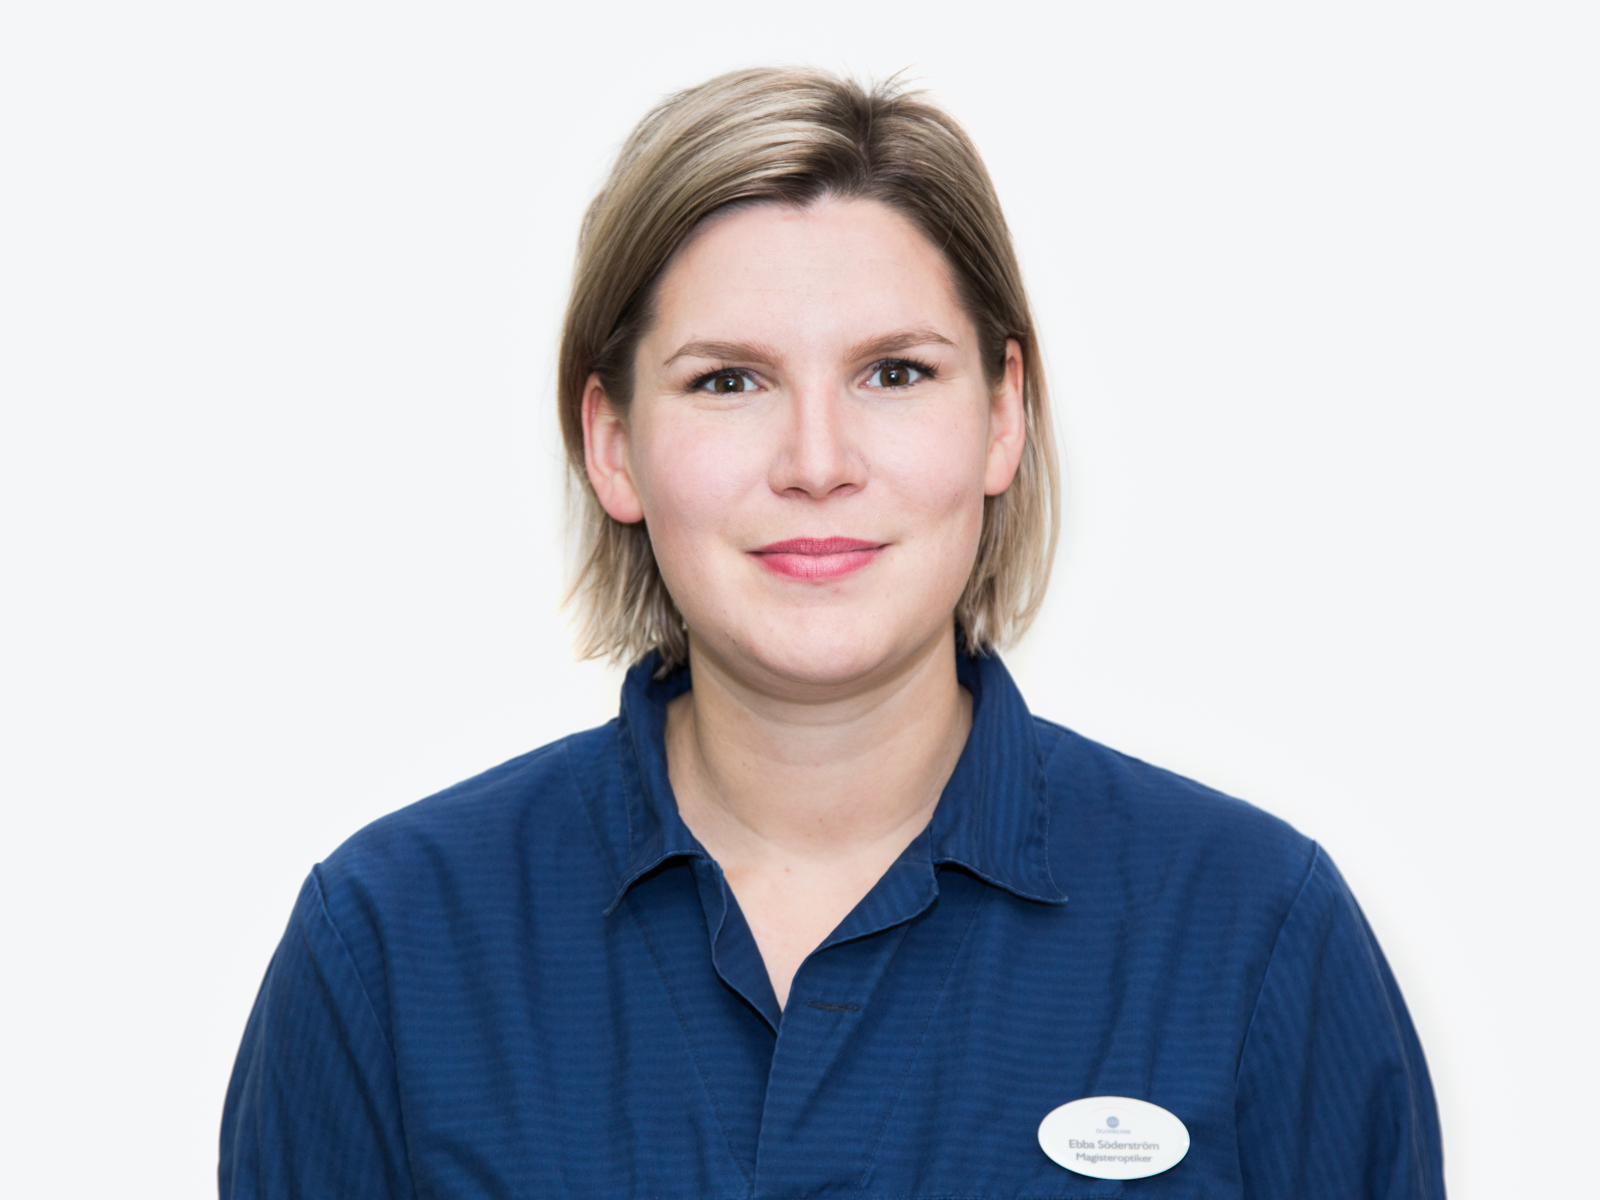 Ebba (Leg optiker med magisterexamen i klinisk optometri.)